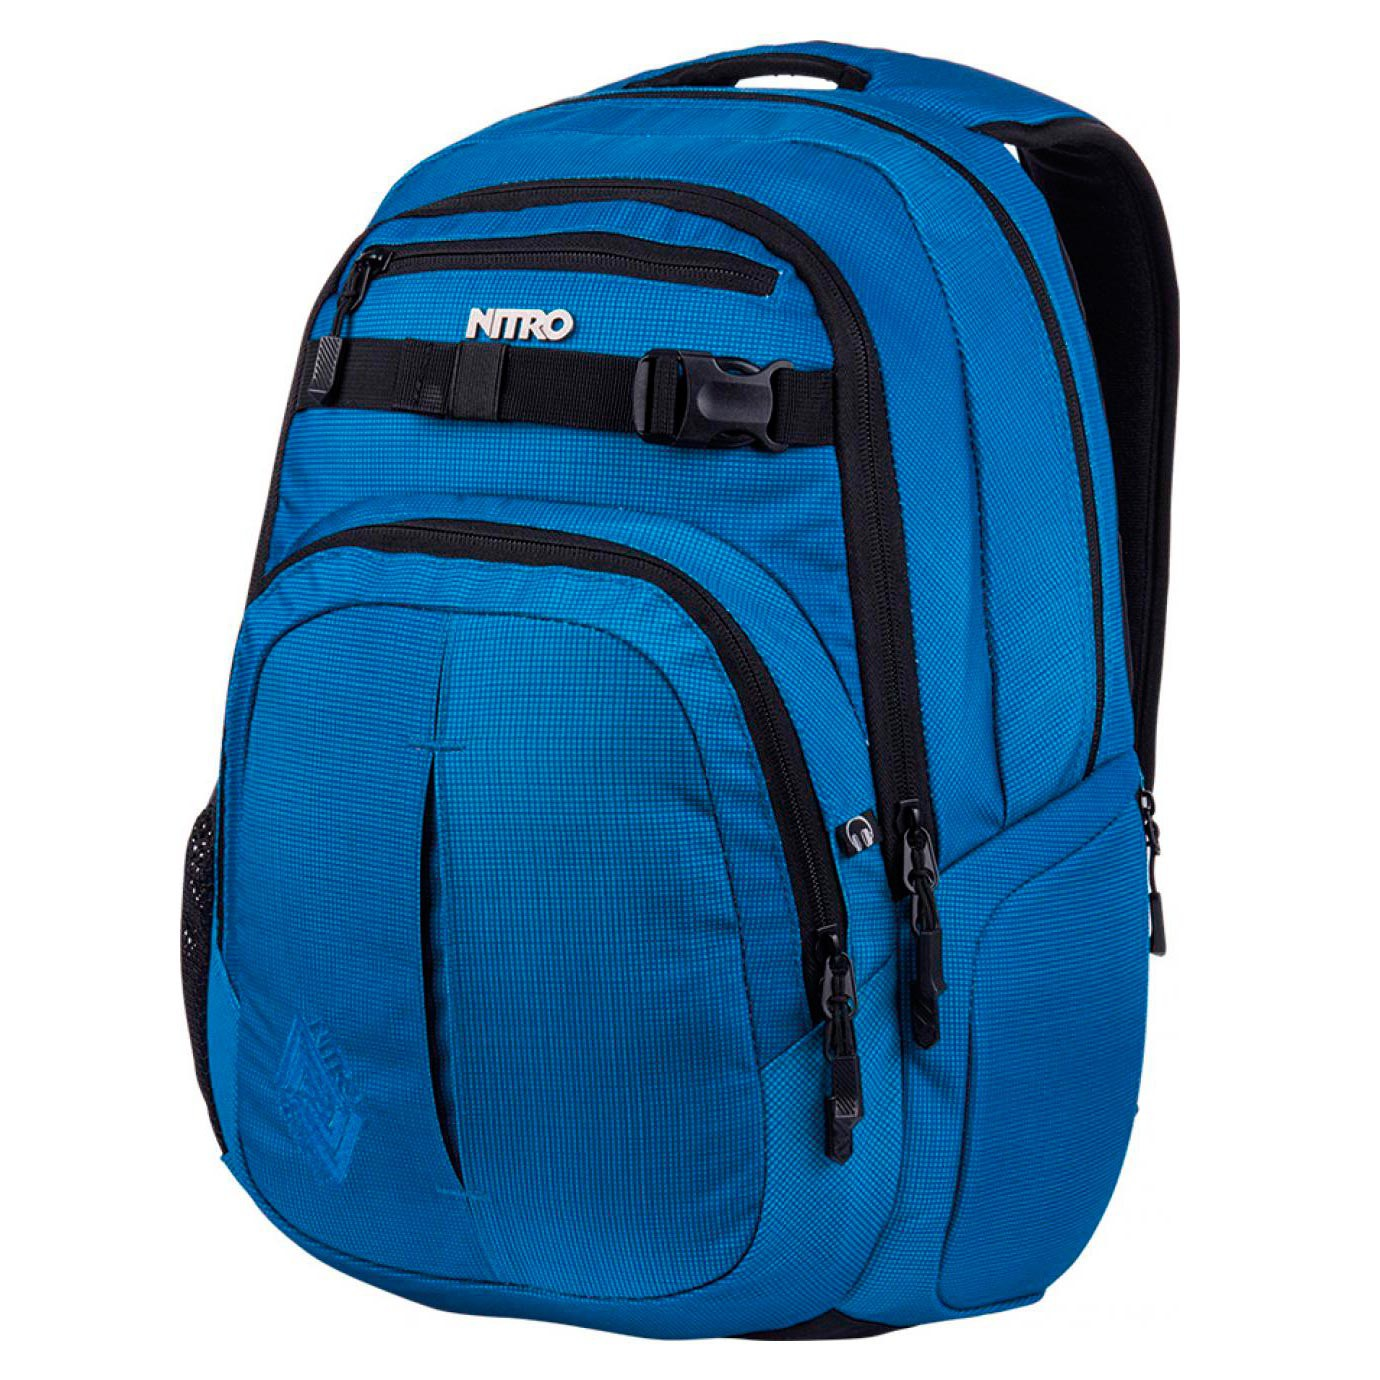 Batoh Nitro Chase blur brilliant blue